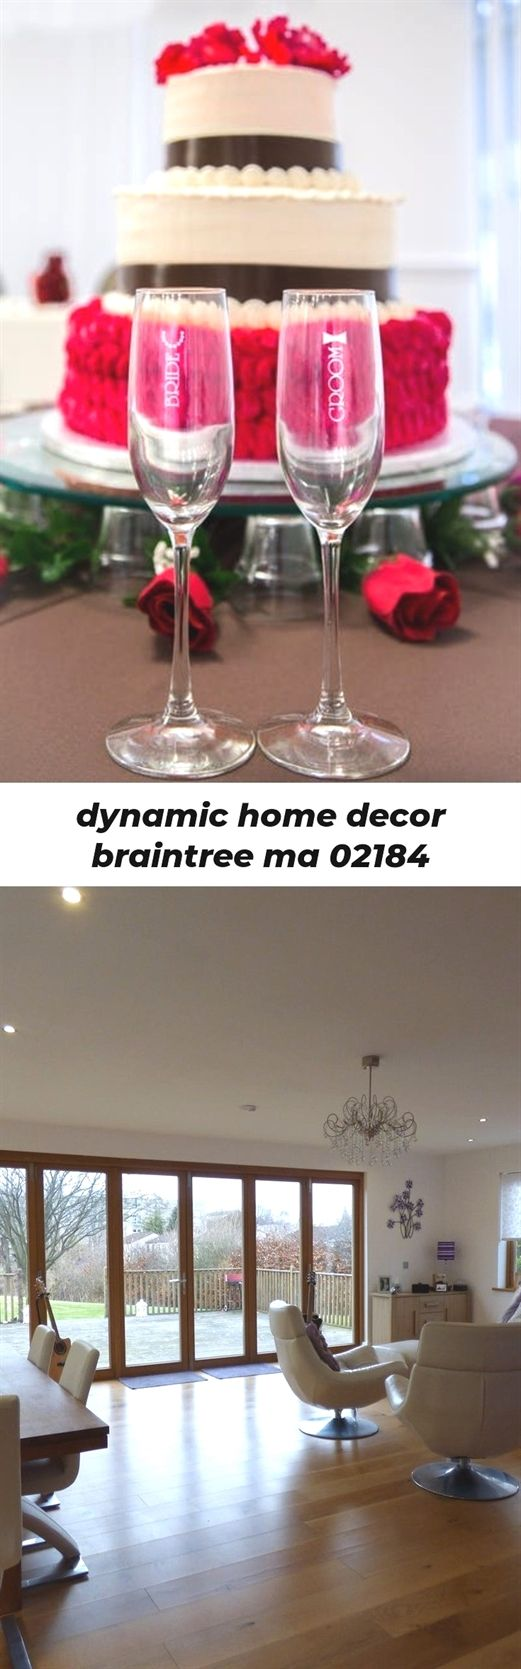 dynamic #home decor braintree ma 02184_1074_20190204103842 ...